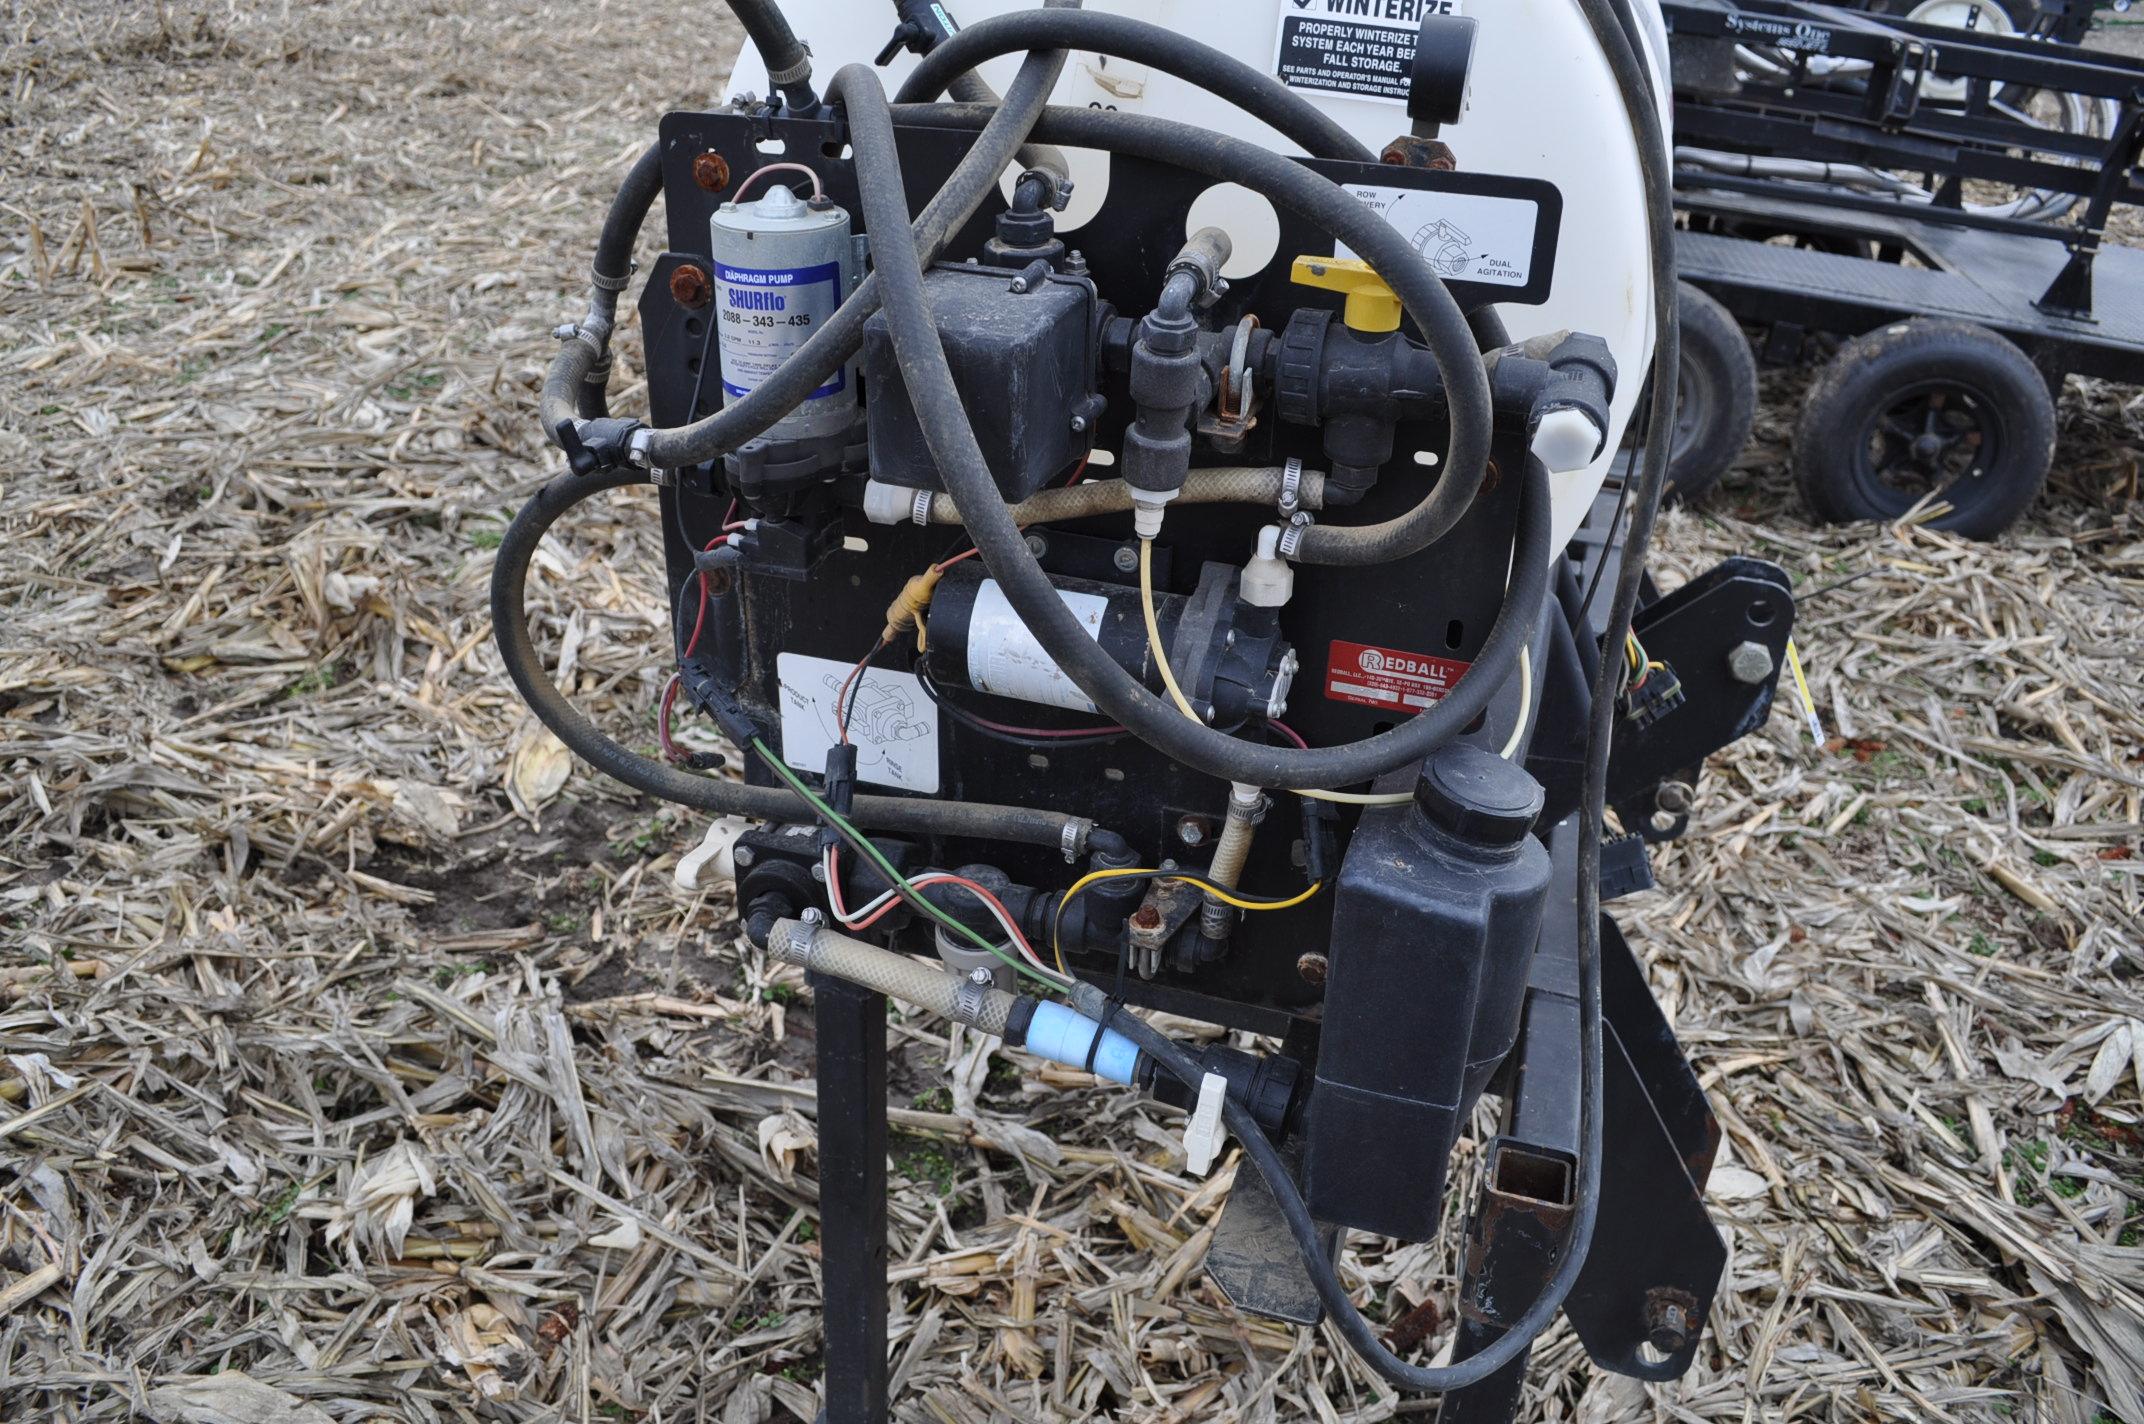 Redball 110 gallon poly tankw/ 12 volt pump, 3 pt. - Image 5 of 10